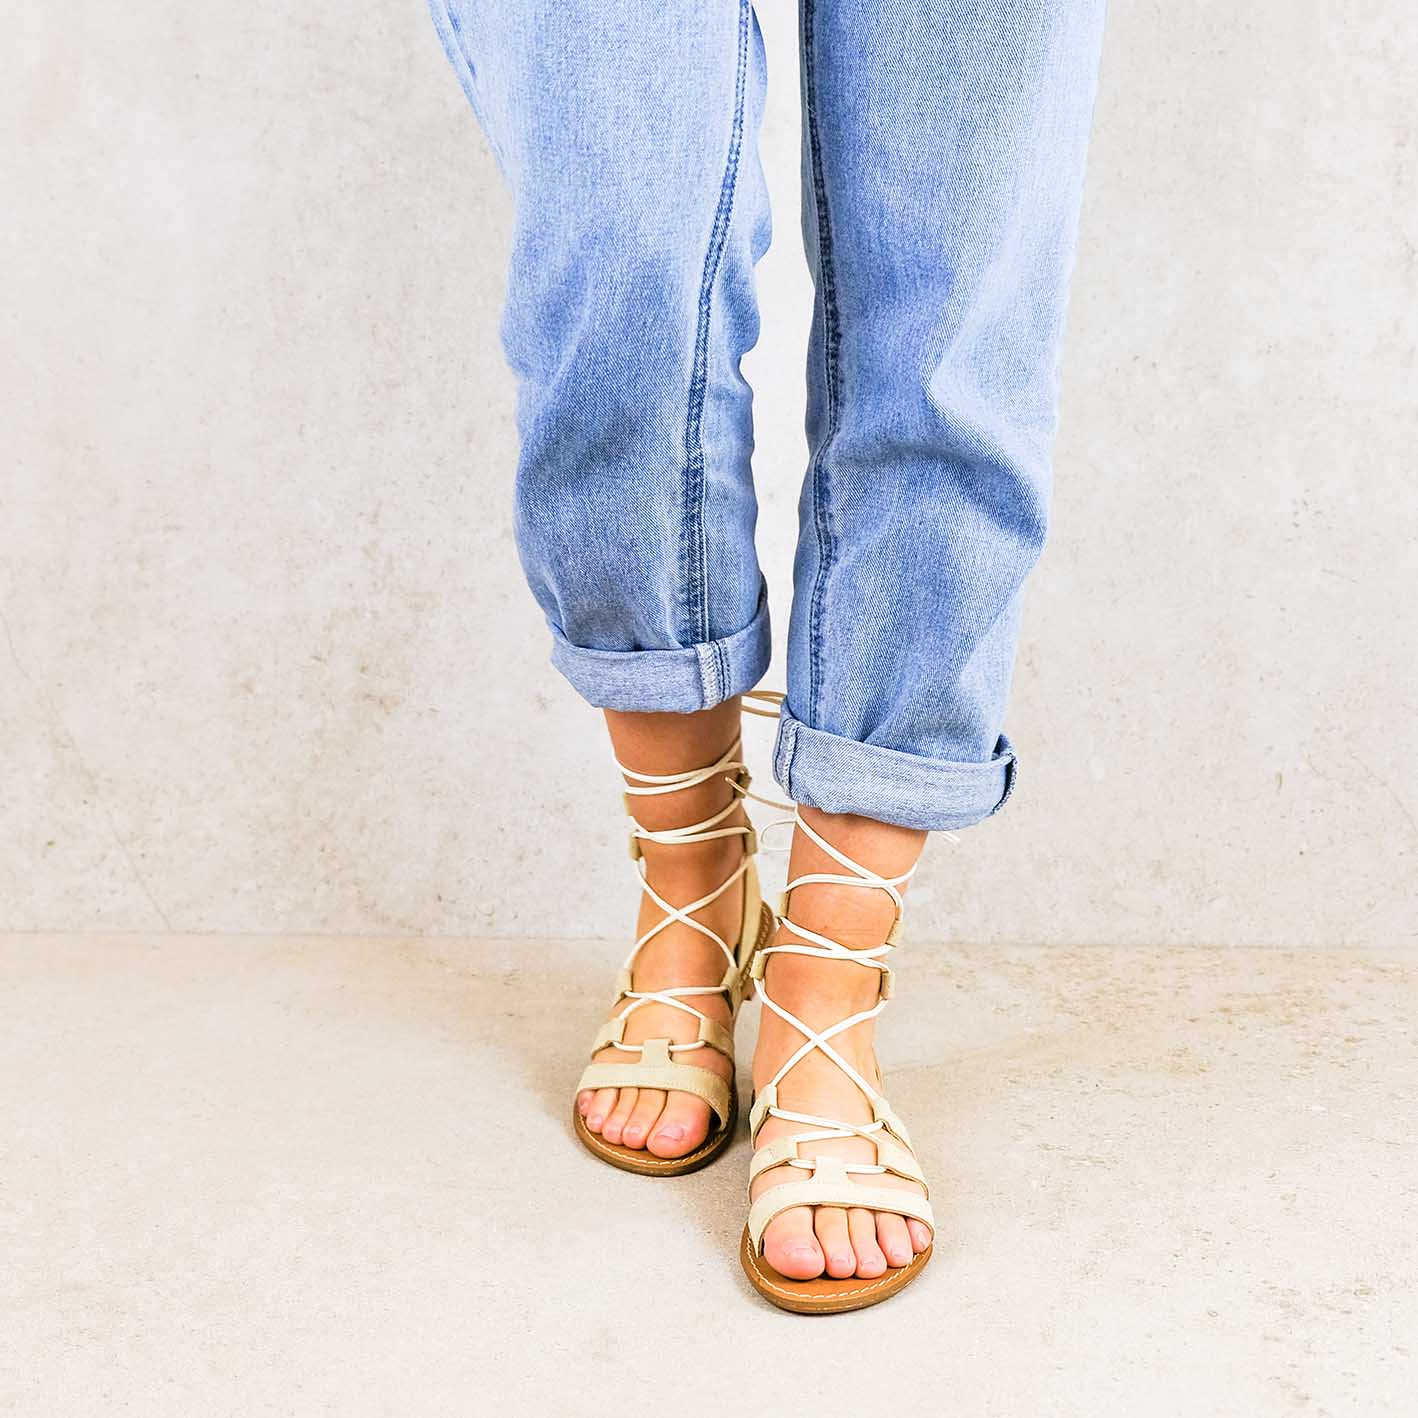 Fe-ivory_lintsandalen sandals travelsandals vegan sustainable sandals wikkelsandalen